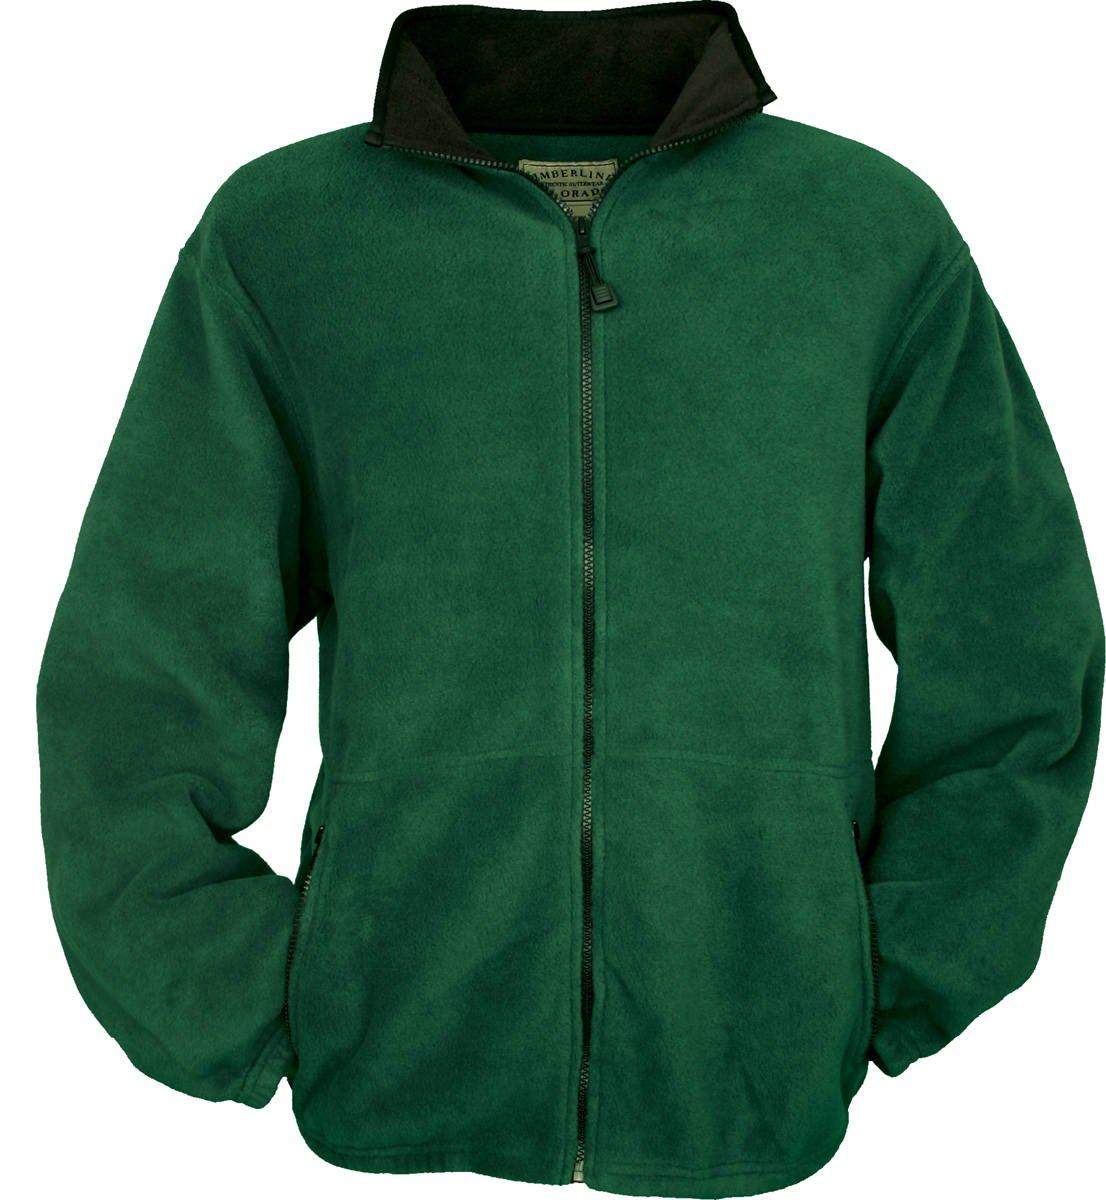 Colorado Timberline Men's Telluride Fleece Jacket-L (Forest) by Colorado Timberline